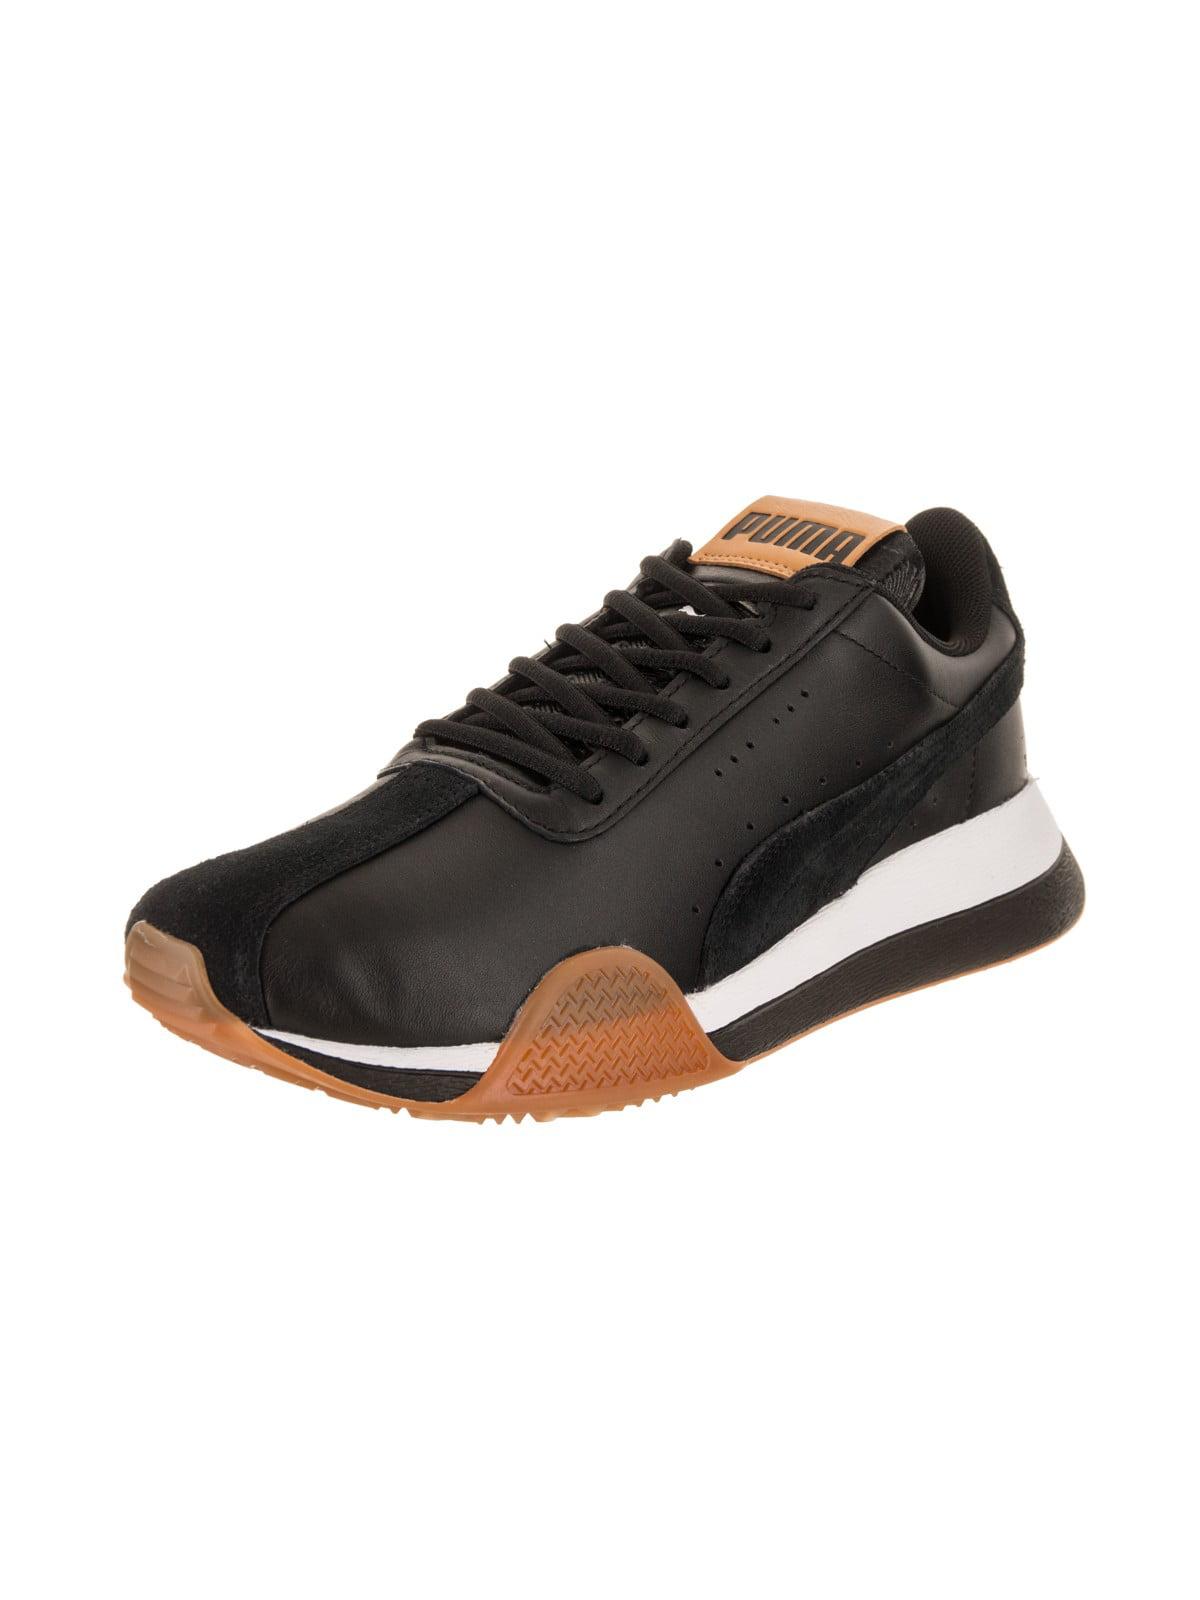 Puma Men's Turin_O Training Shoe